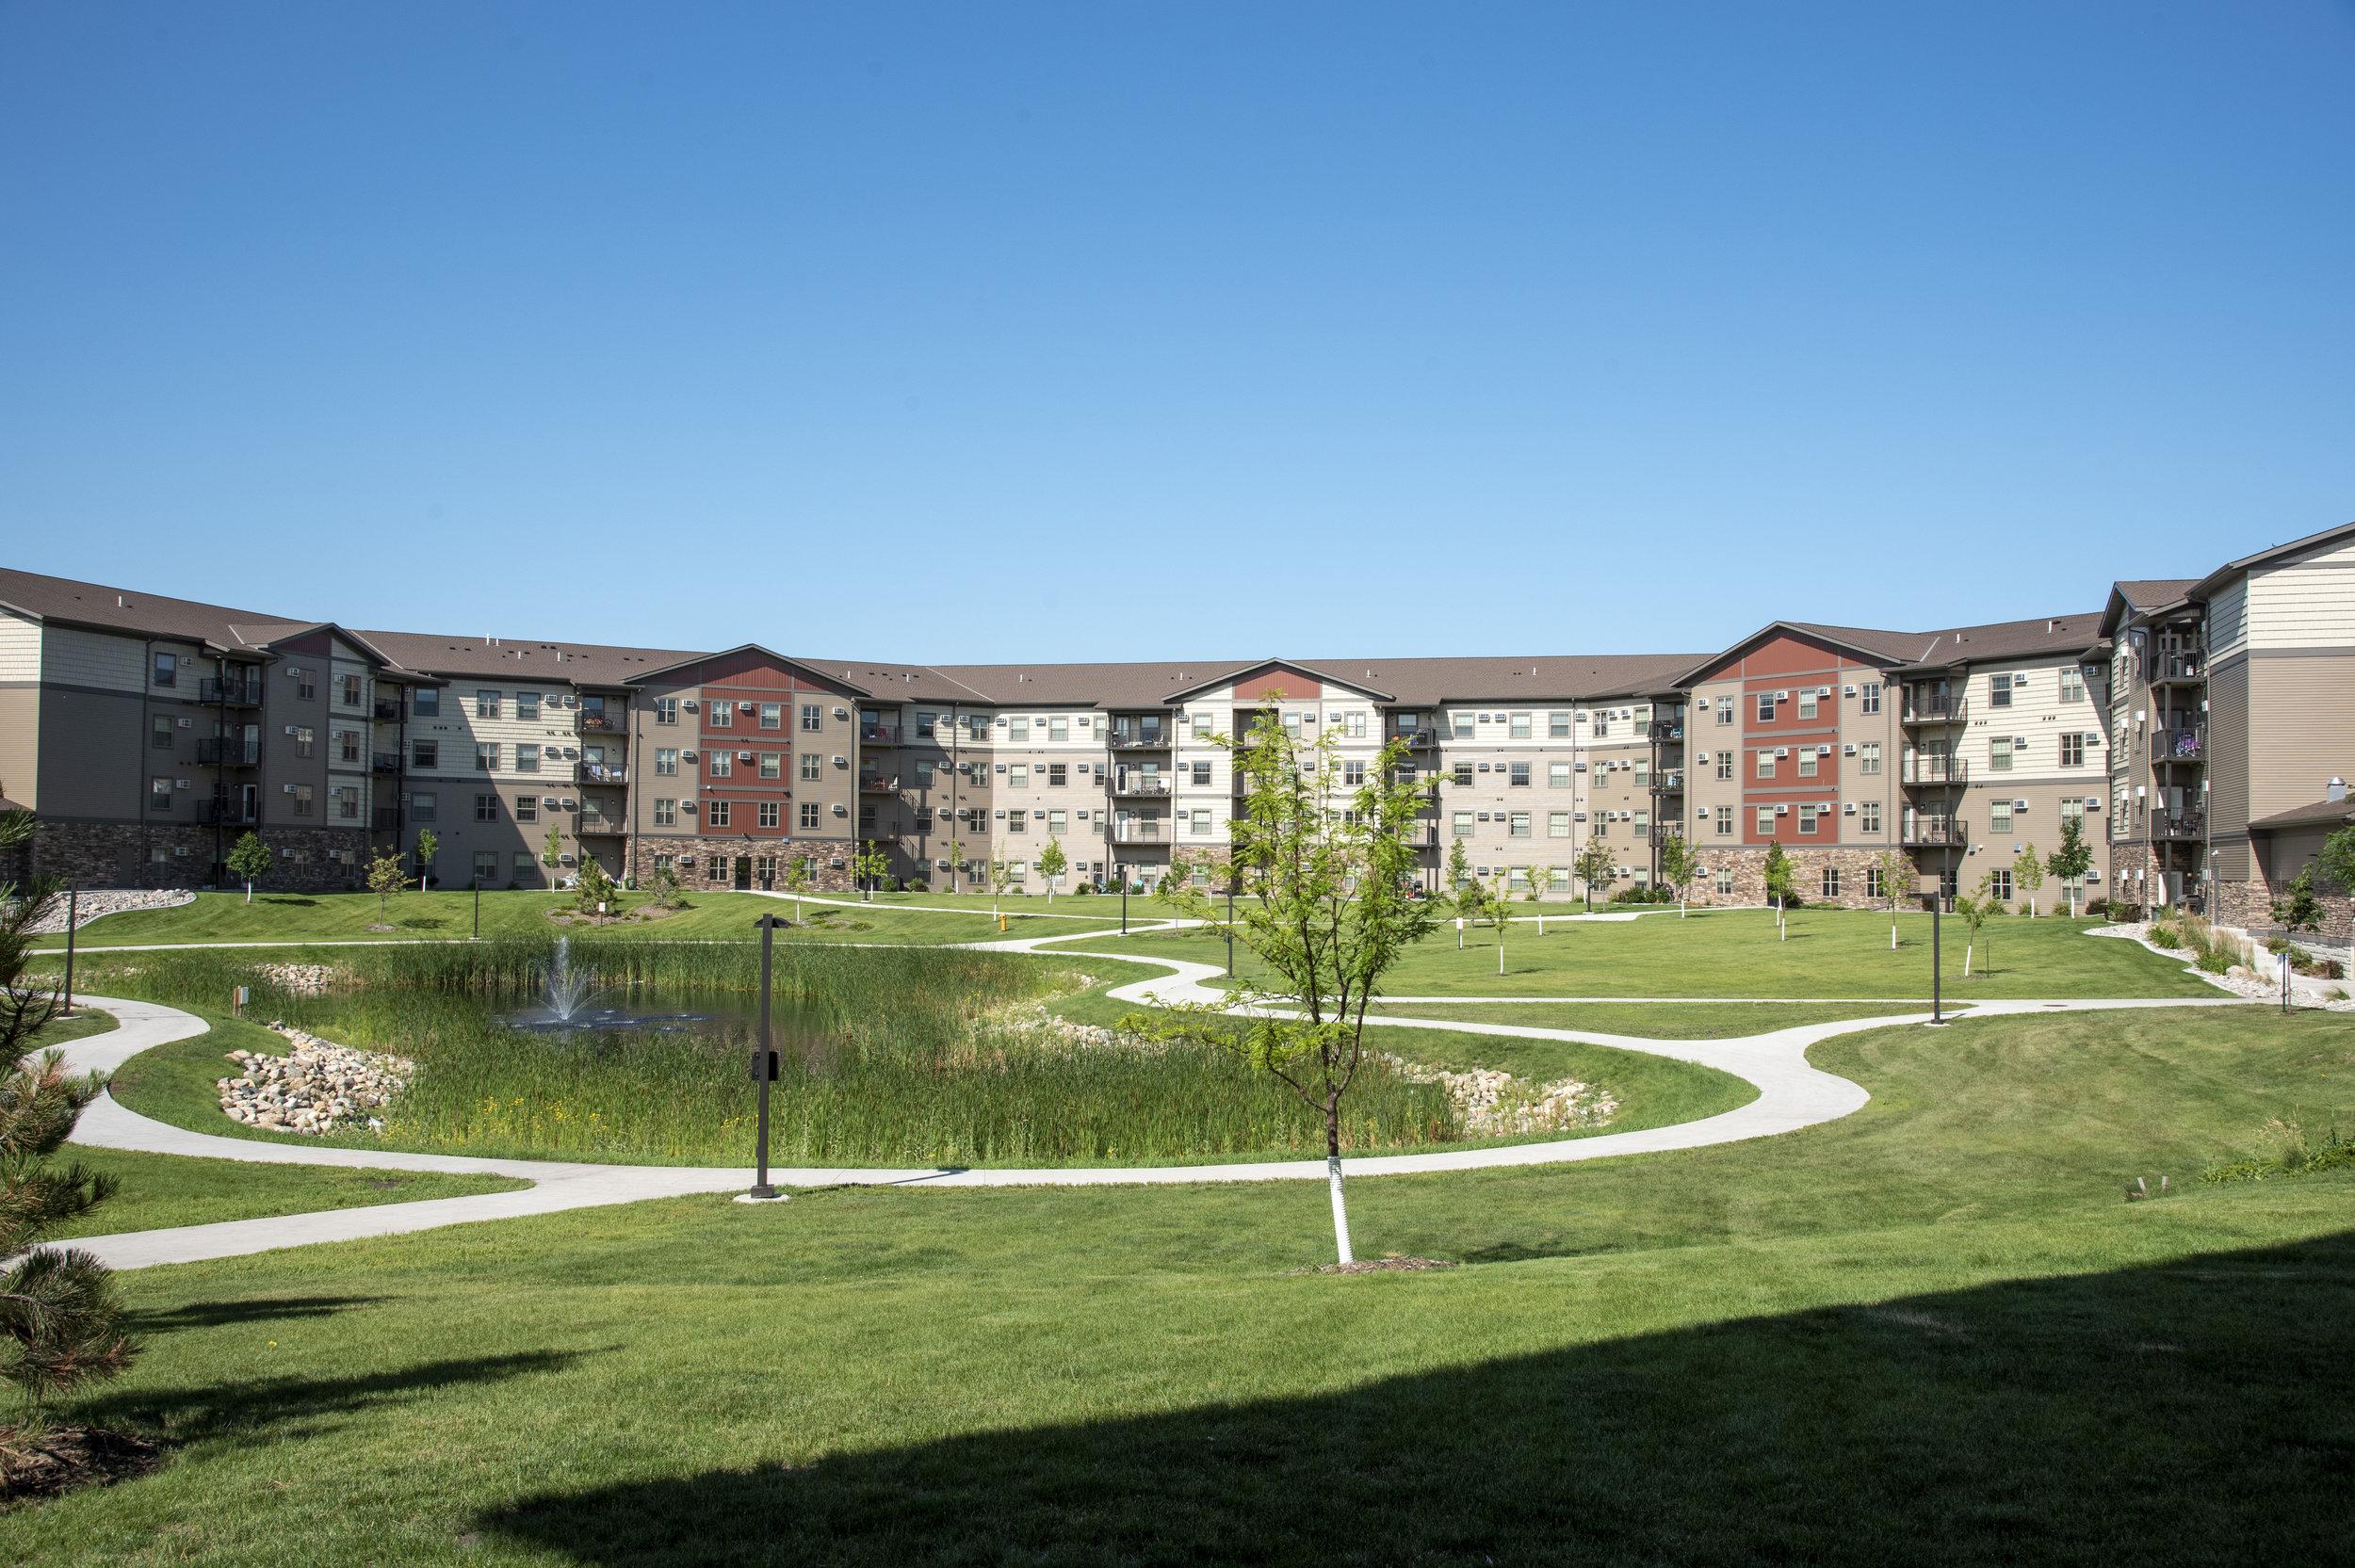 28 You_ll Enjoy Court Yard Views of the Fountain _ Lush Greenery.jpg